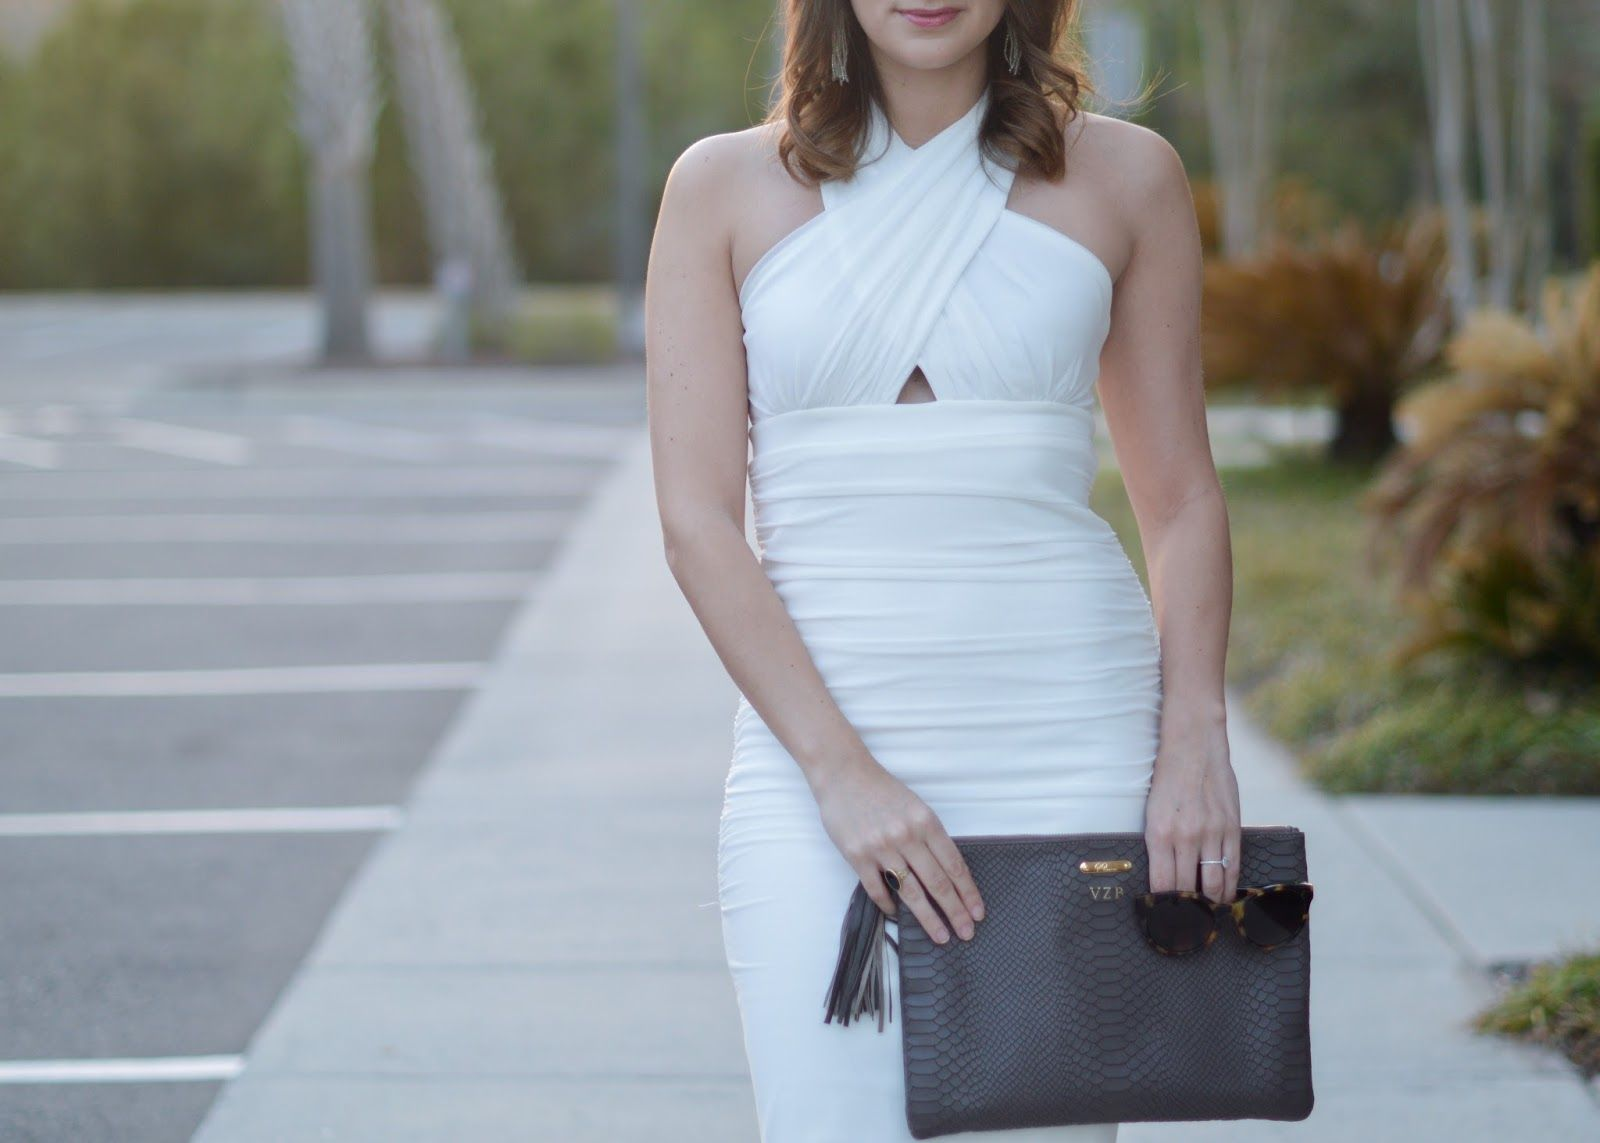 White Engagement Party Dress | Engagement party dresses